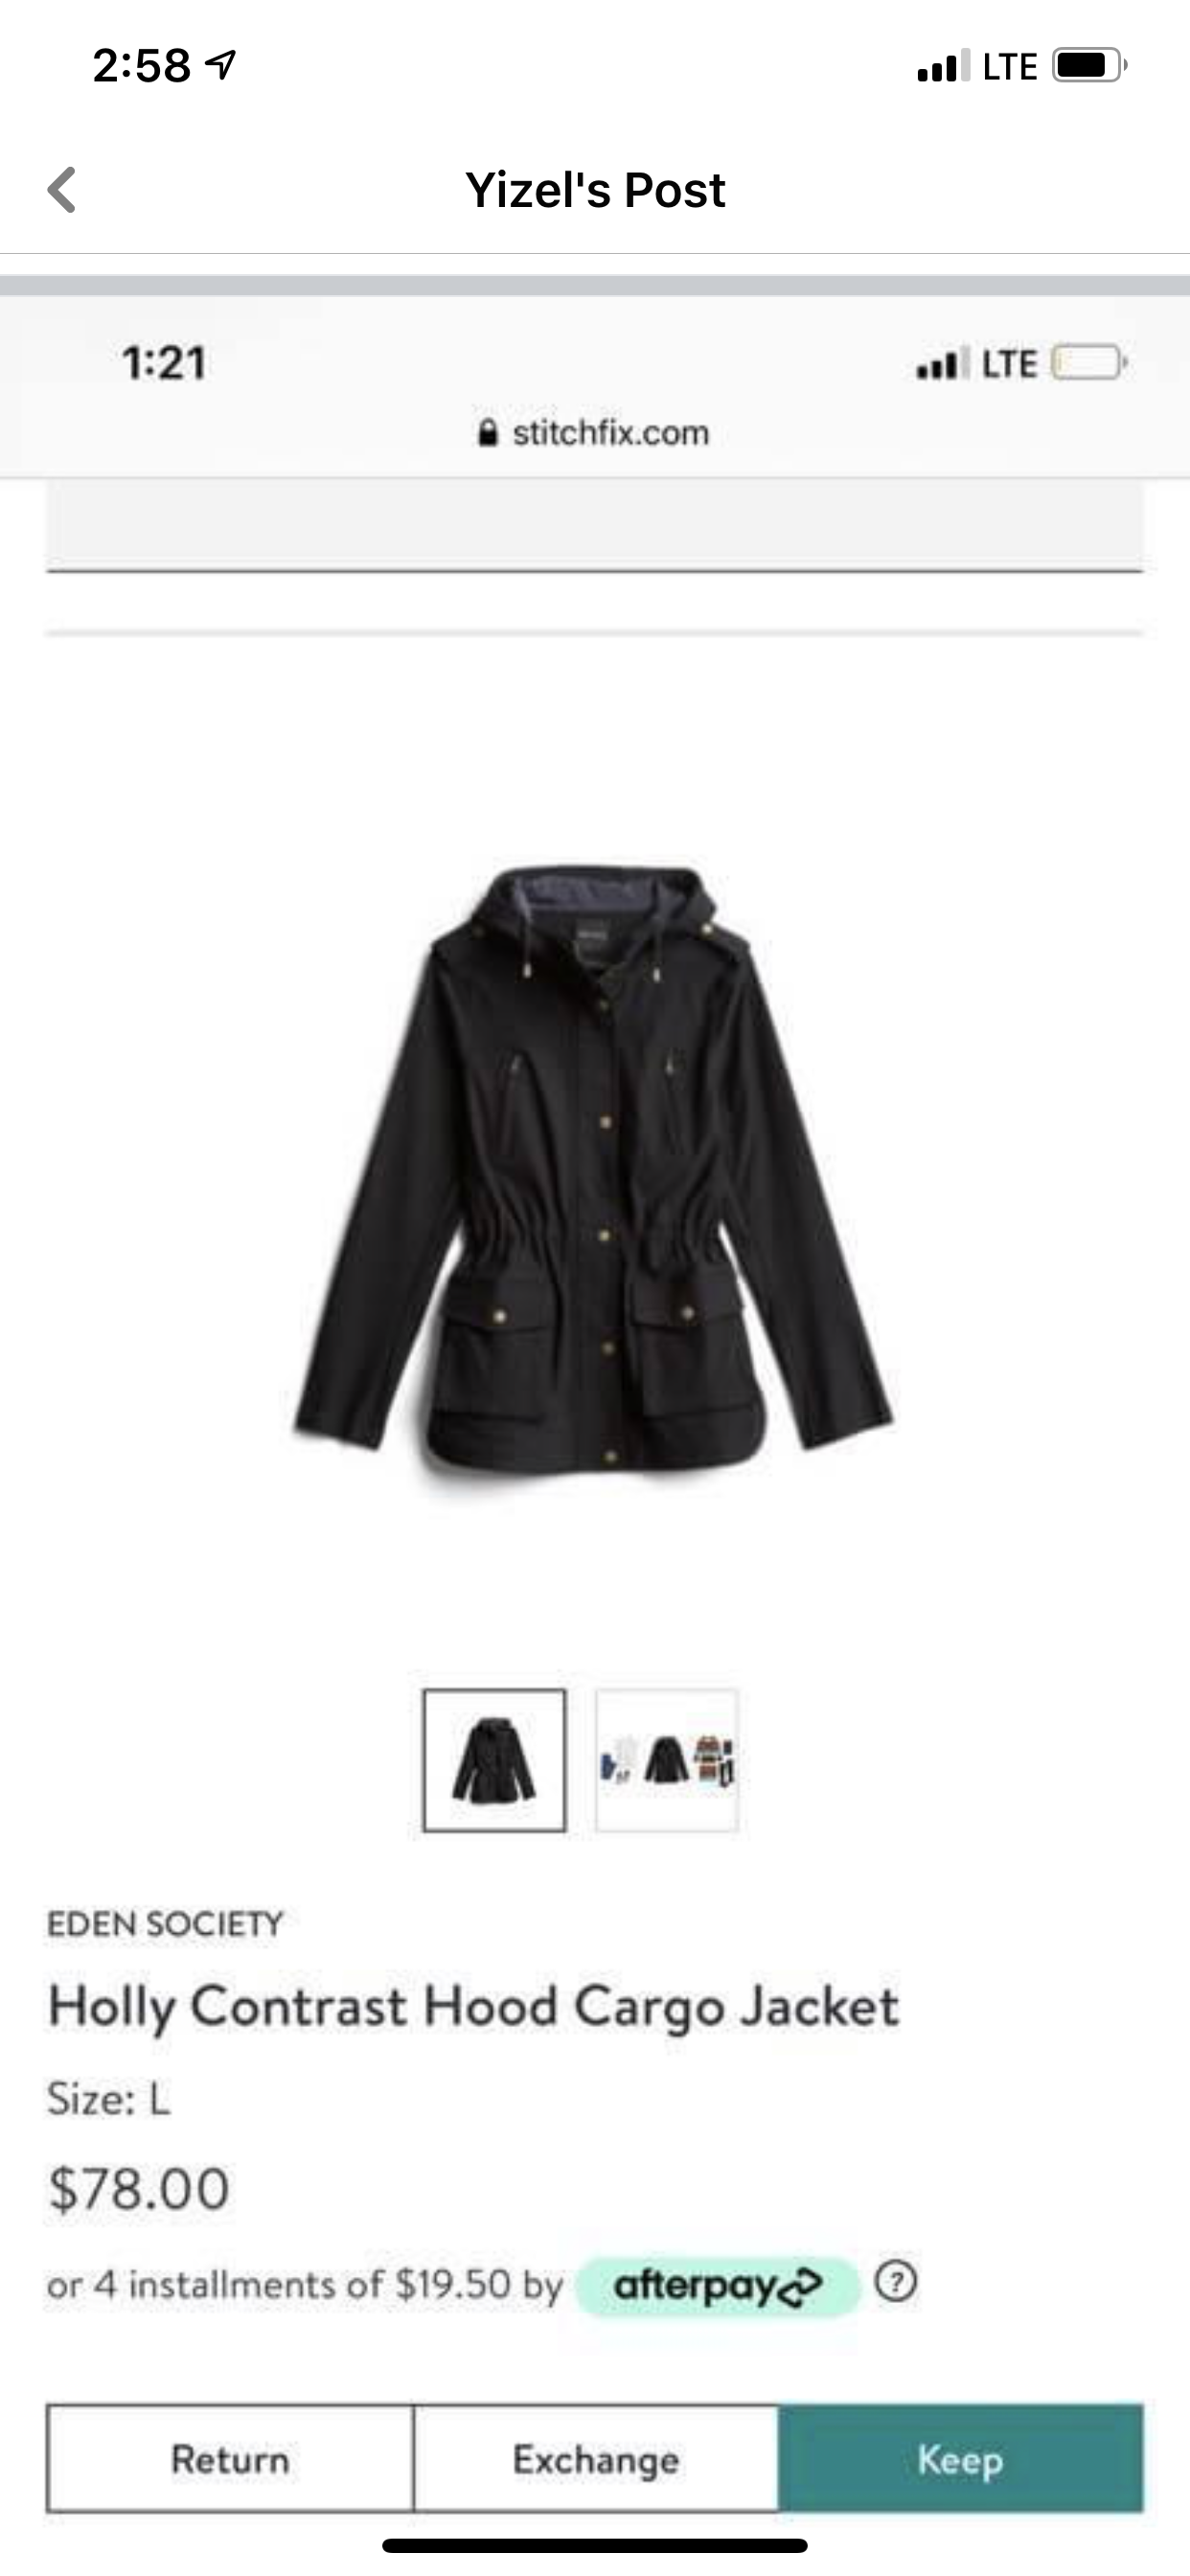 Pin By Keli Elizabeth On Stitch Fix Fashion Leather Jacket Jackets [ 2688 x 1242 Pixel ]